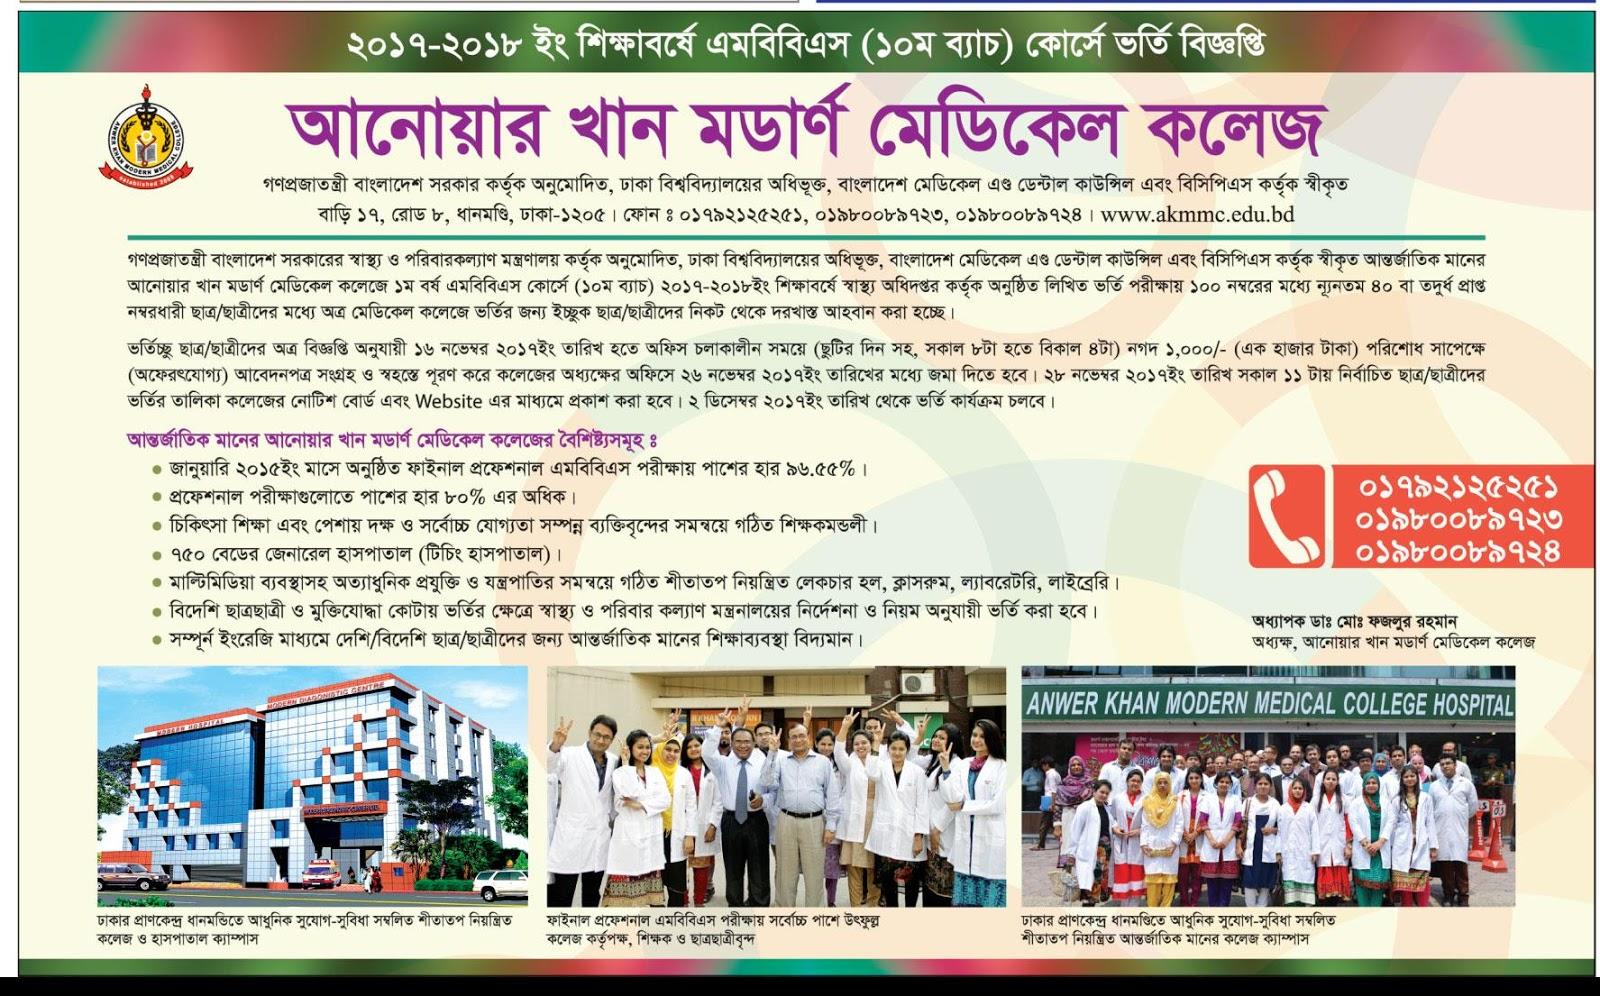 Anower Khan Modern Medical College MBBS Admission